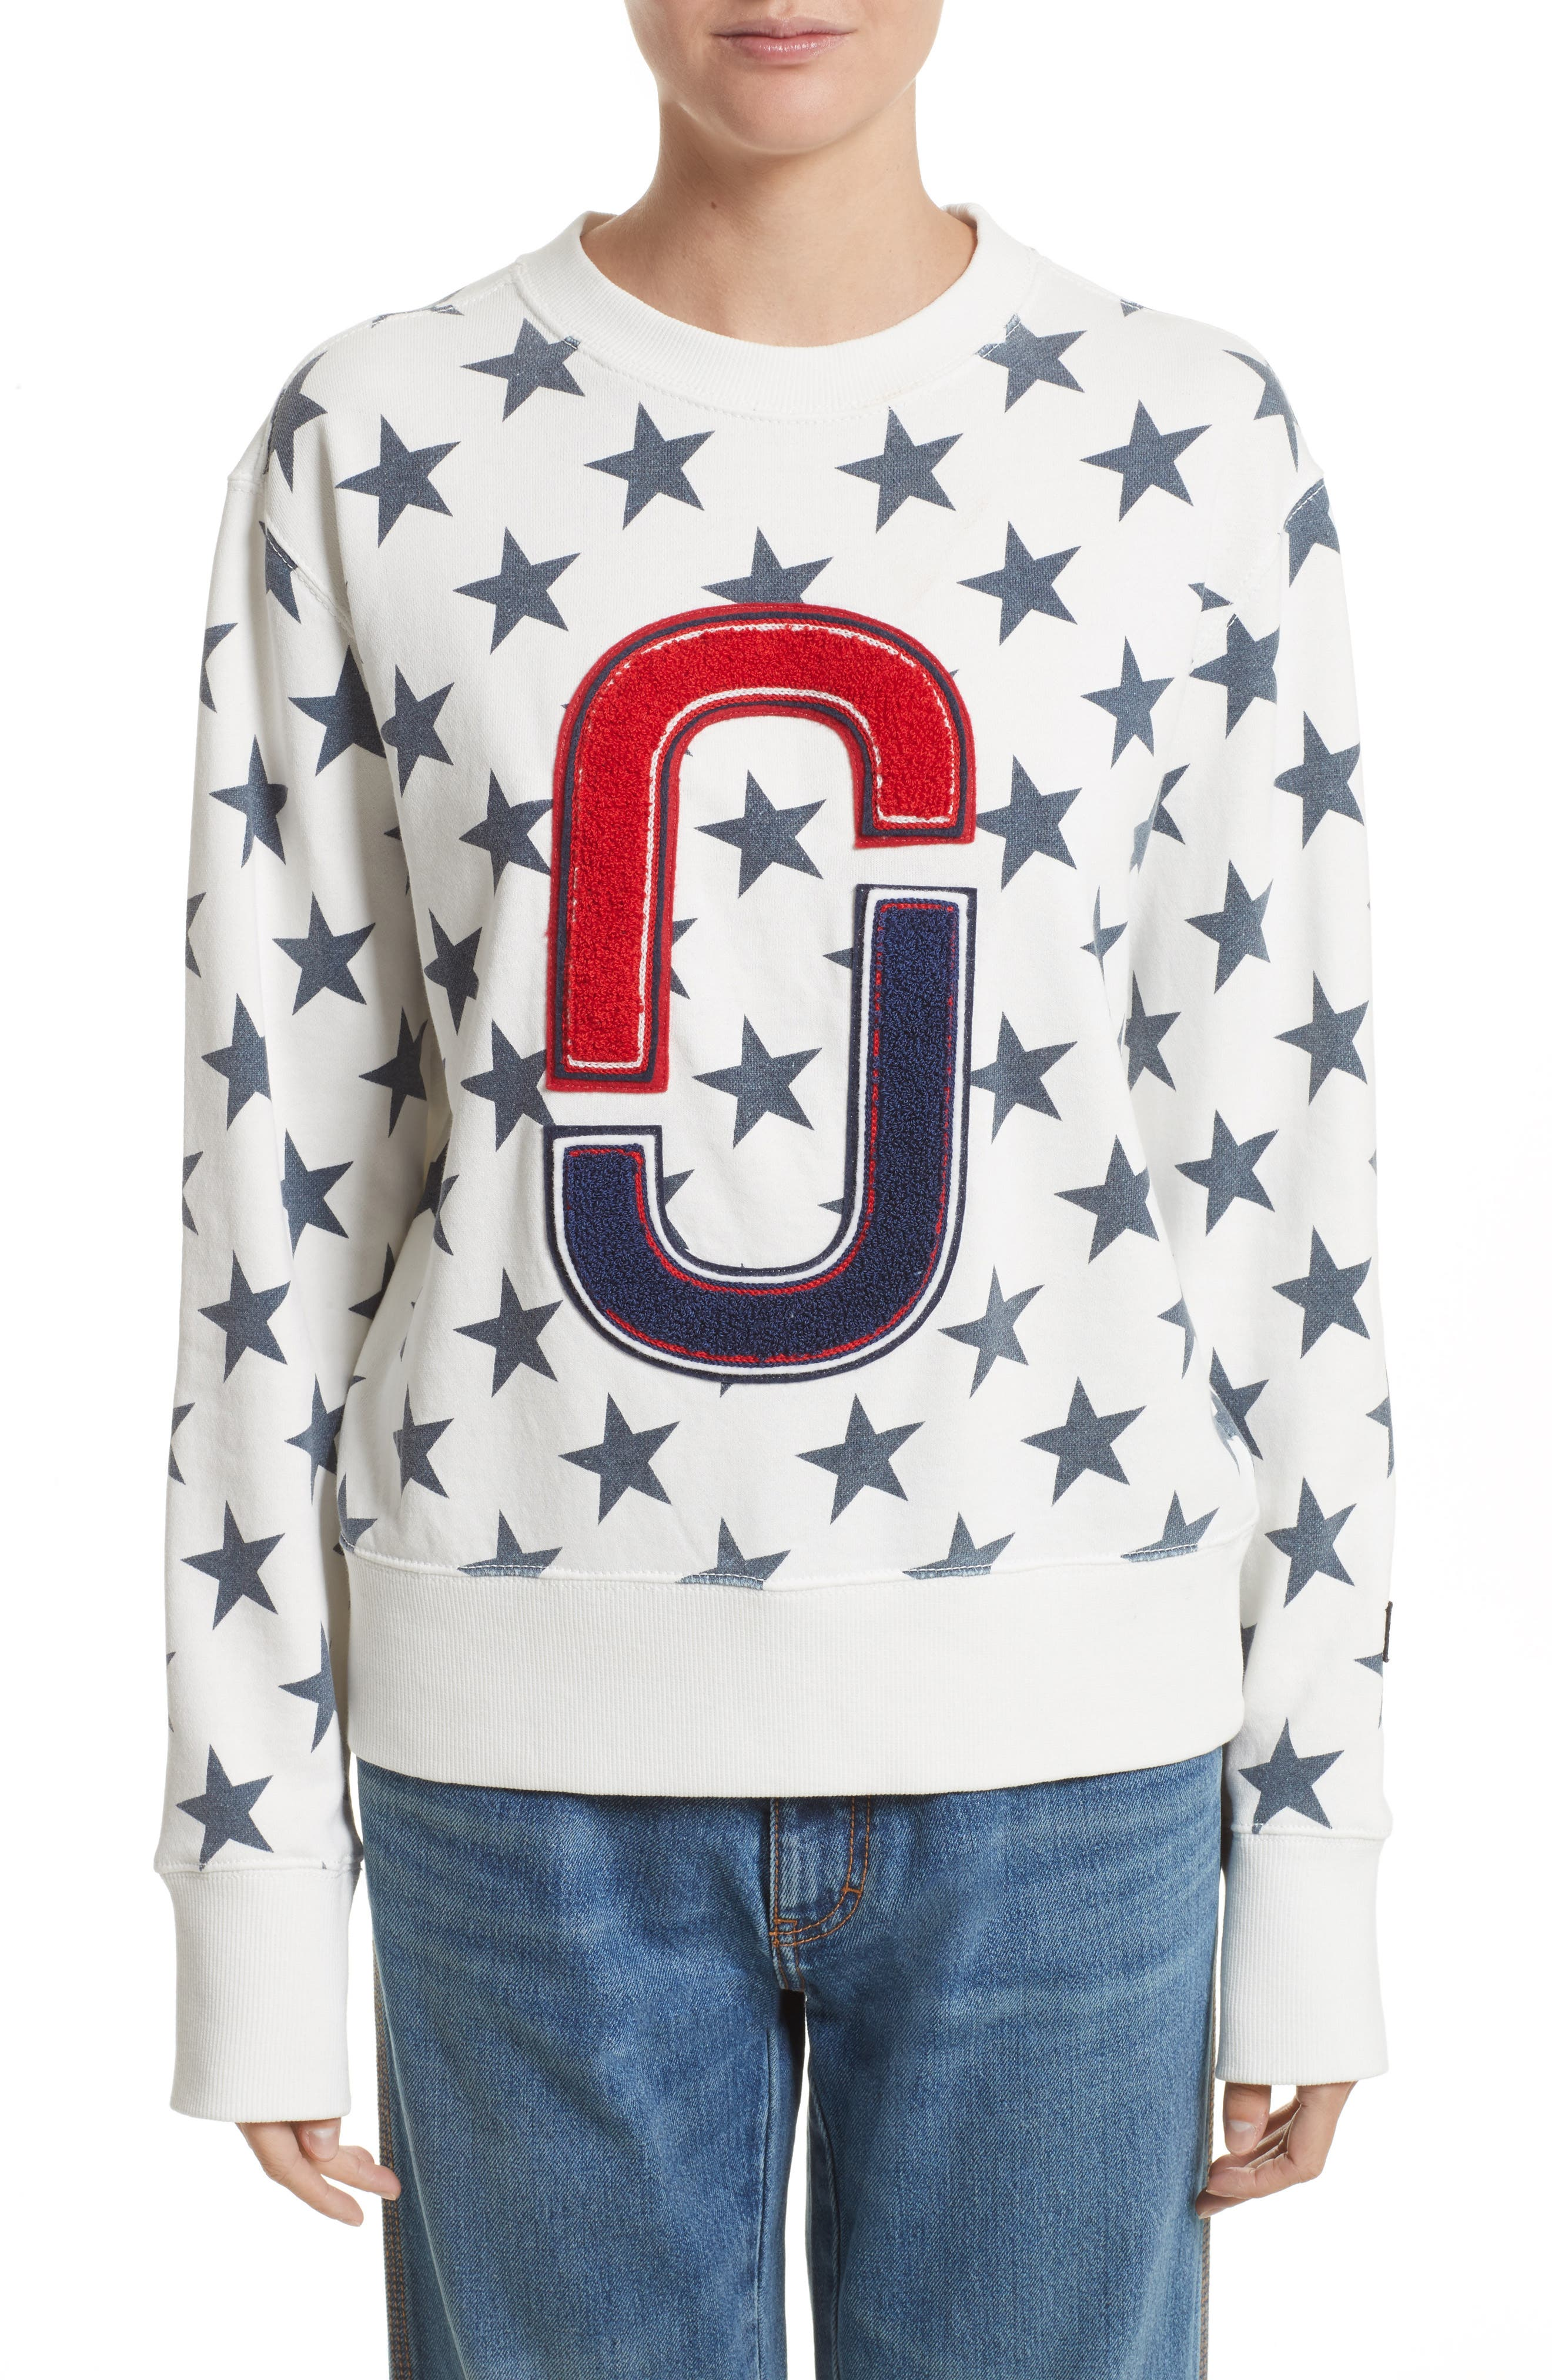 '90s Star Print Sweatshirt,                             Main thumbnail 1, color,                             Ivory Multi